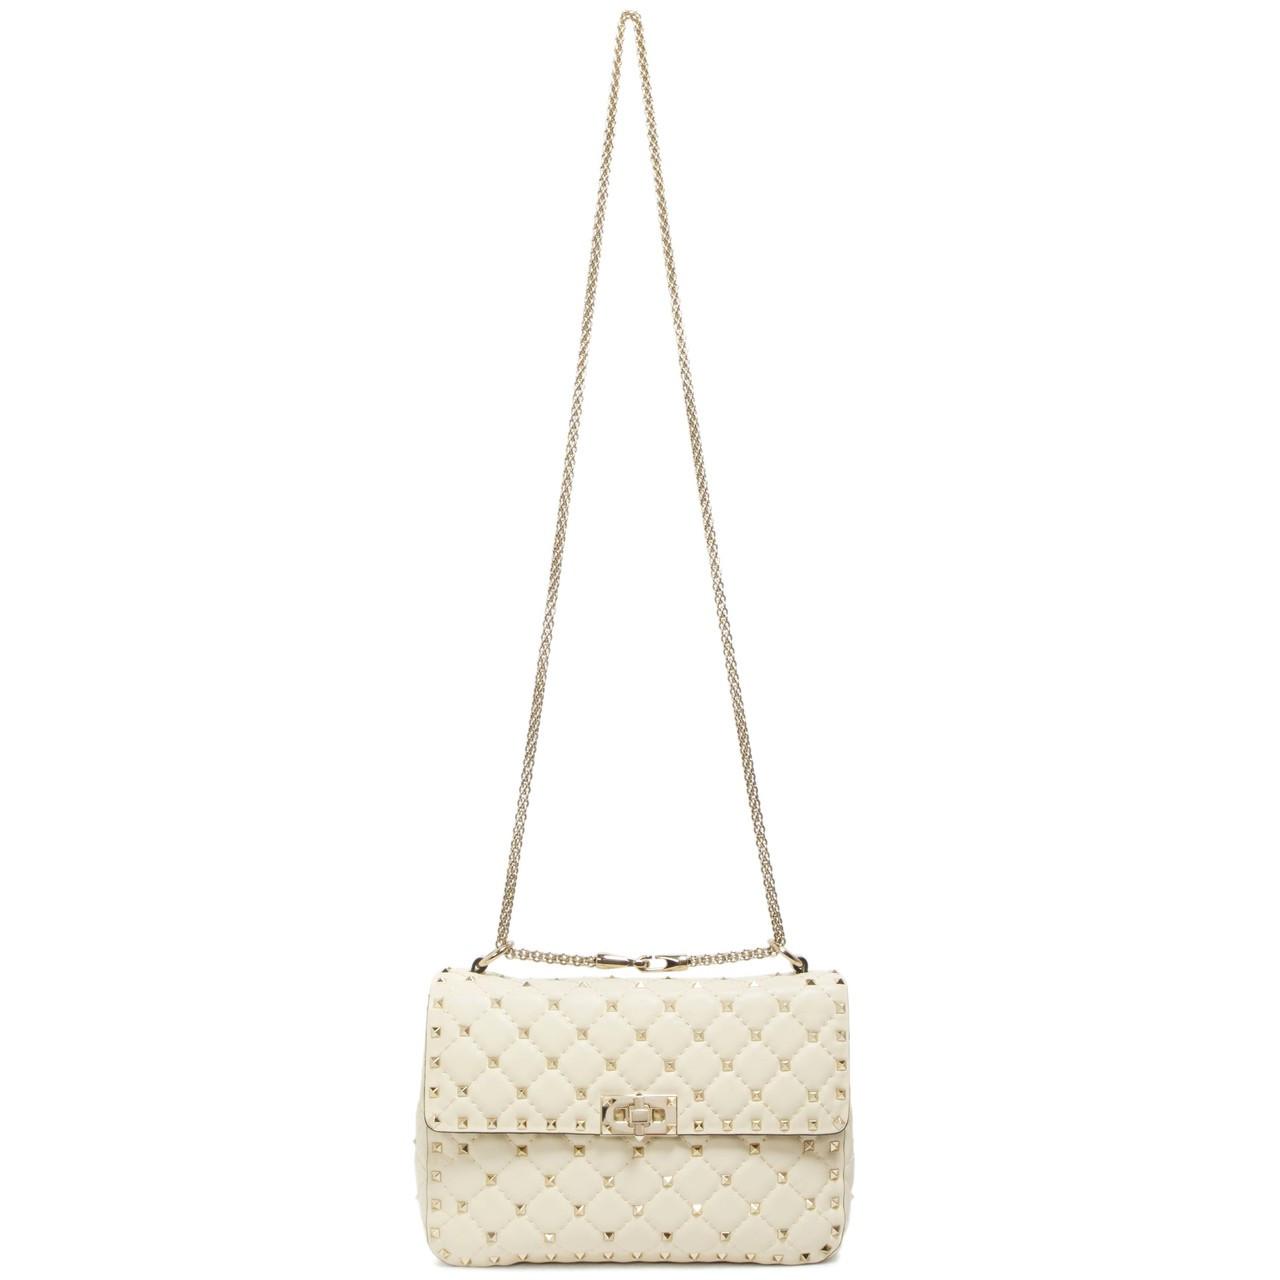 7734ffcc7d Valentino Ivory Lambskin Medium Rockstud Spike Shoulder Bag - modaselle